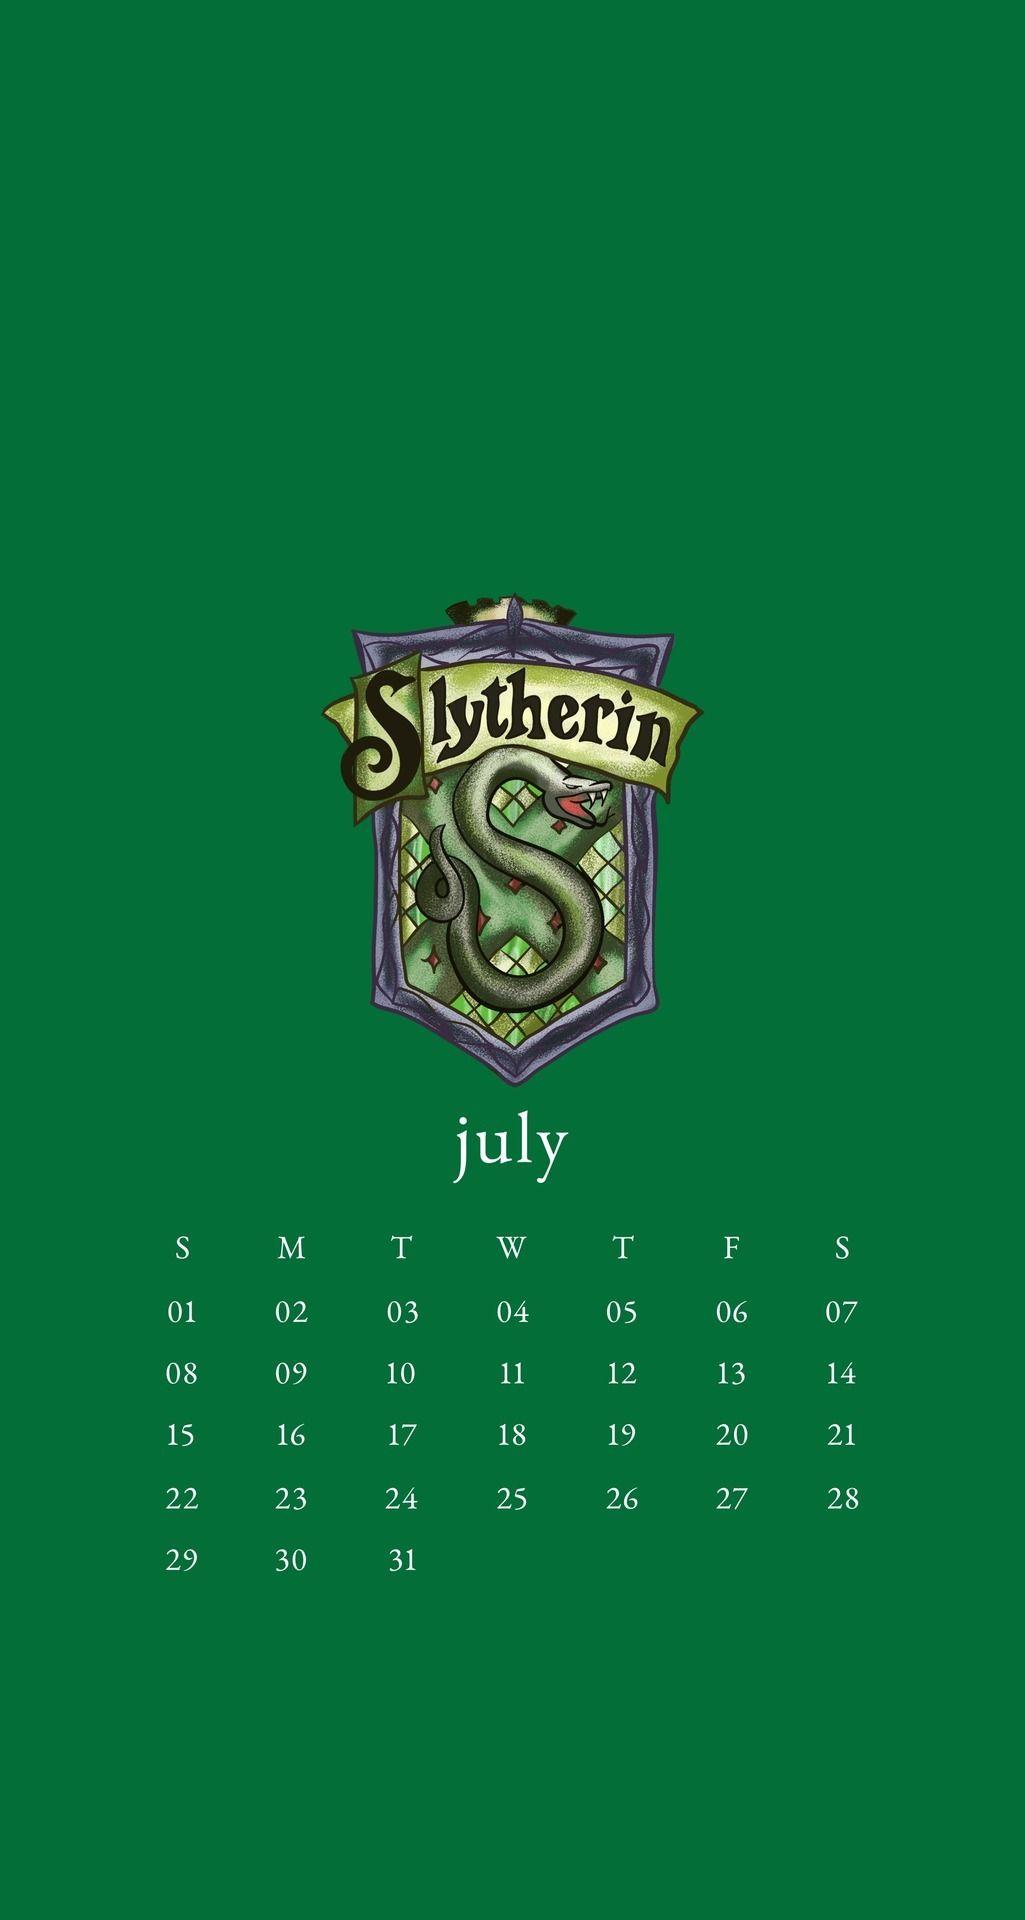 Slytherin Laptop Wallpapers On Wallpaperdog